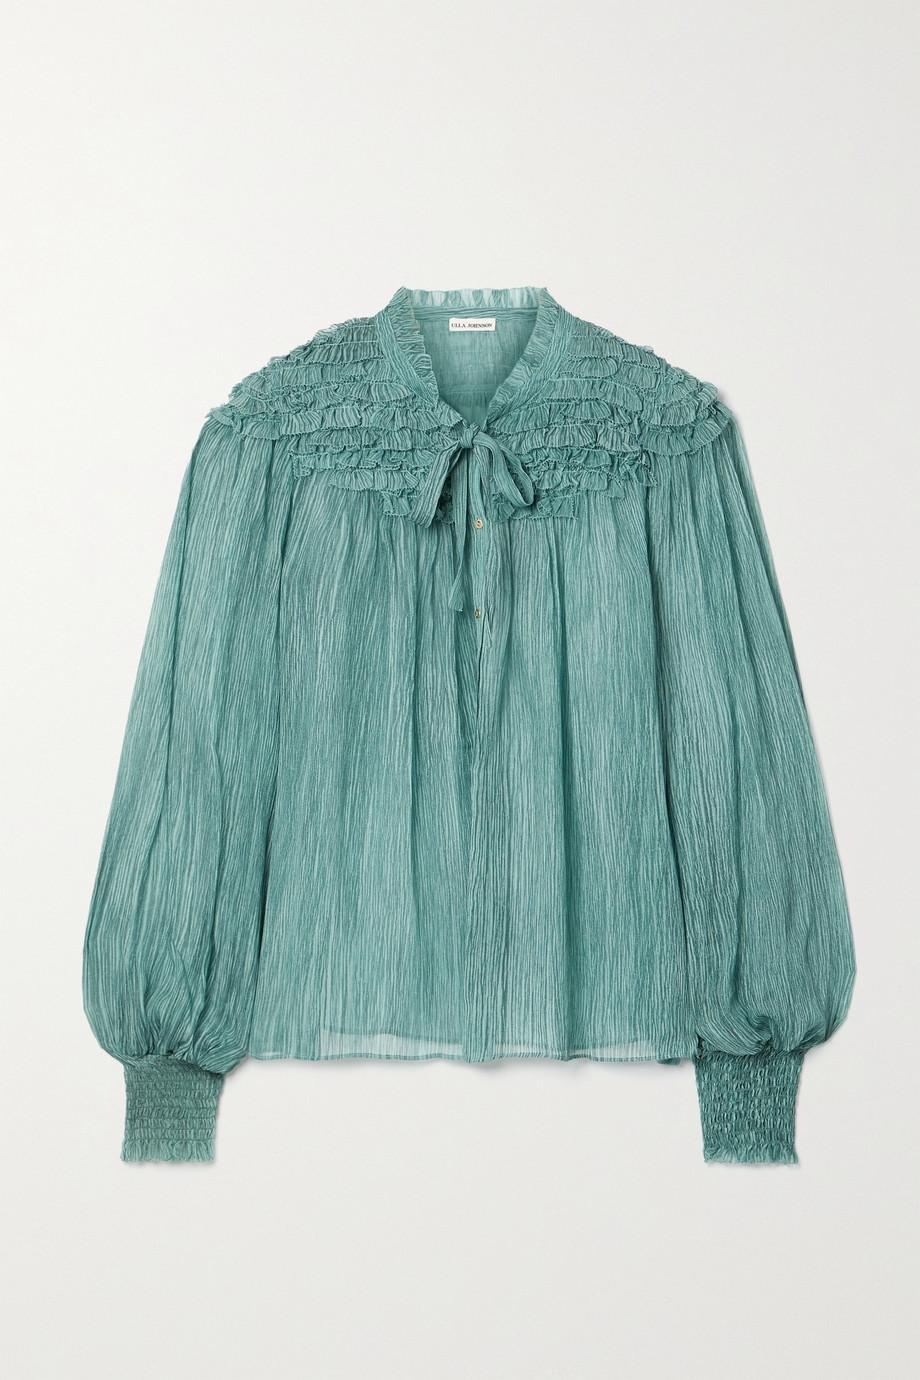 Ulla Johnson Eloise tie-neck ruffled silk-crepon blouse